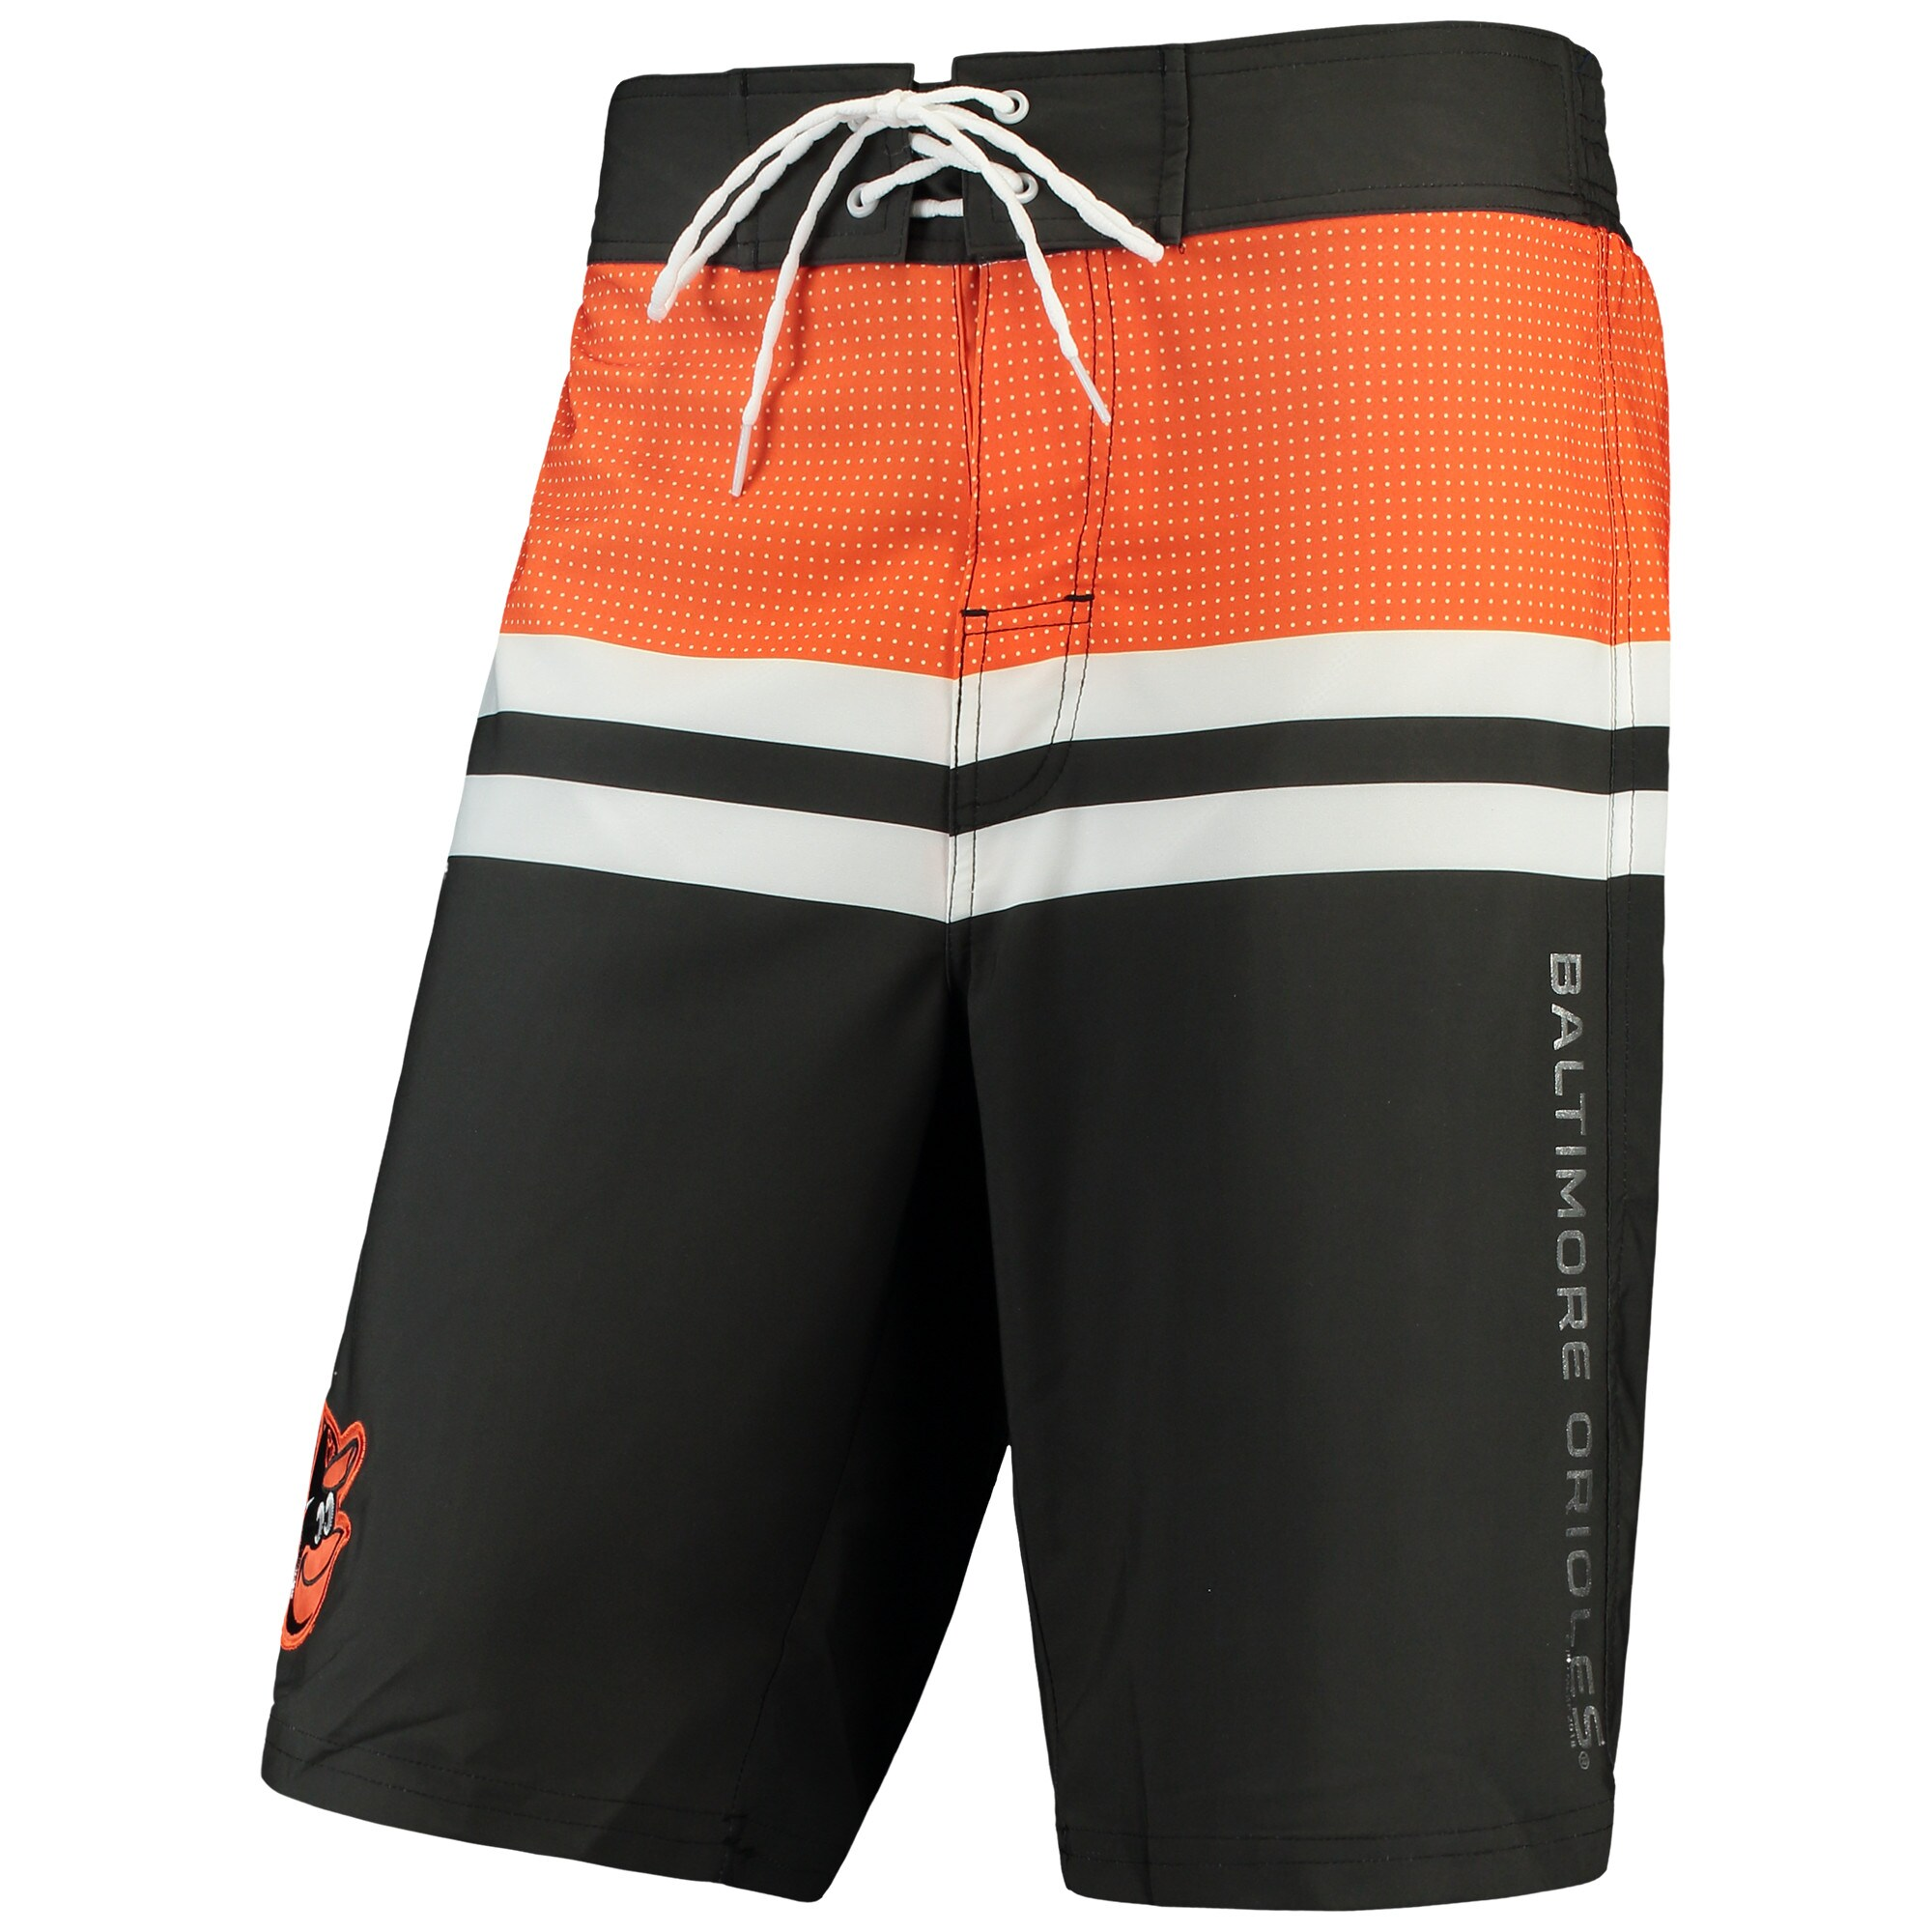 Baltimore Orioles G-III Sports by Carl Banks MLB Interception Swim Trunks - Black/Orange